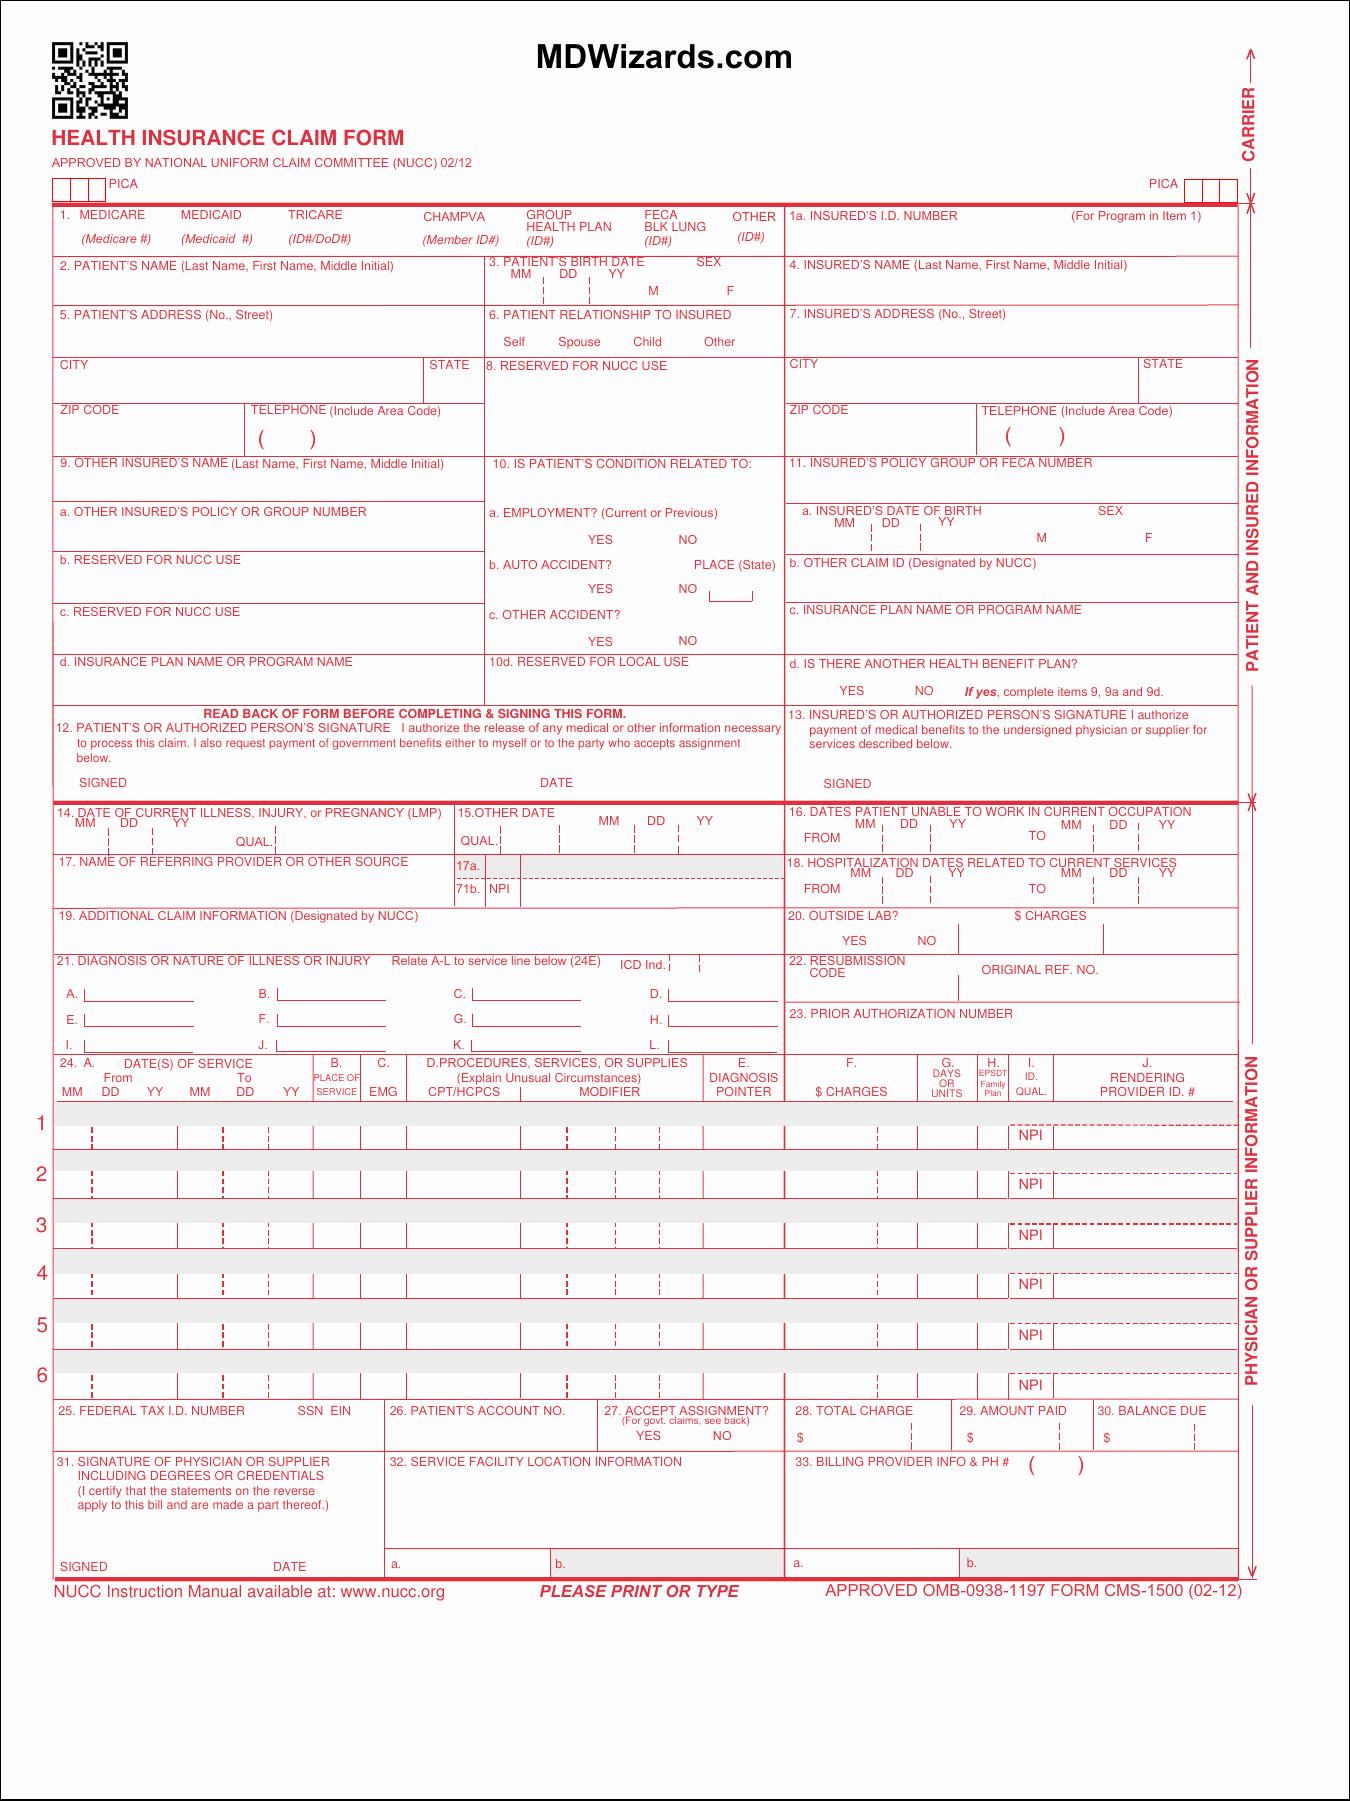 hcfa 1500 form